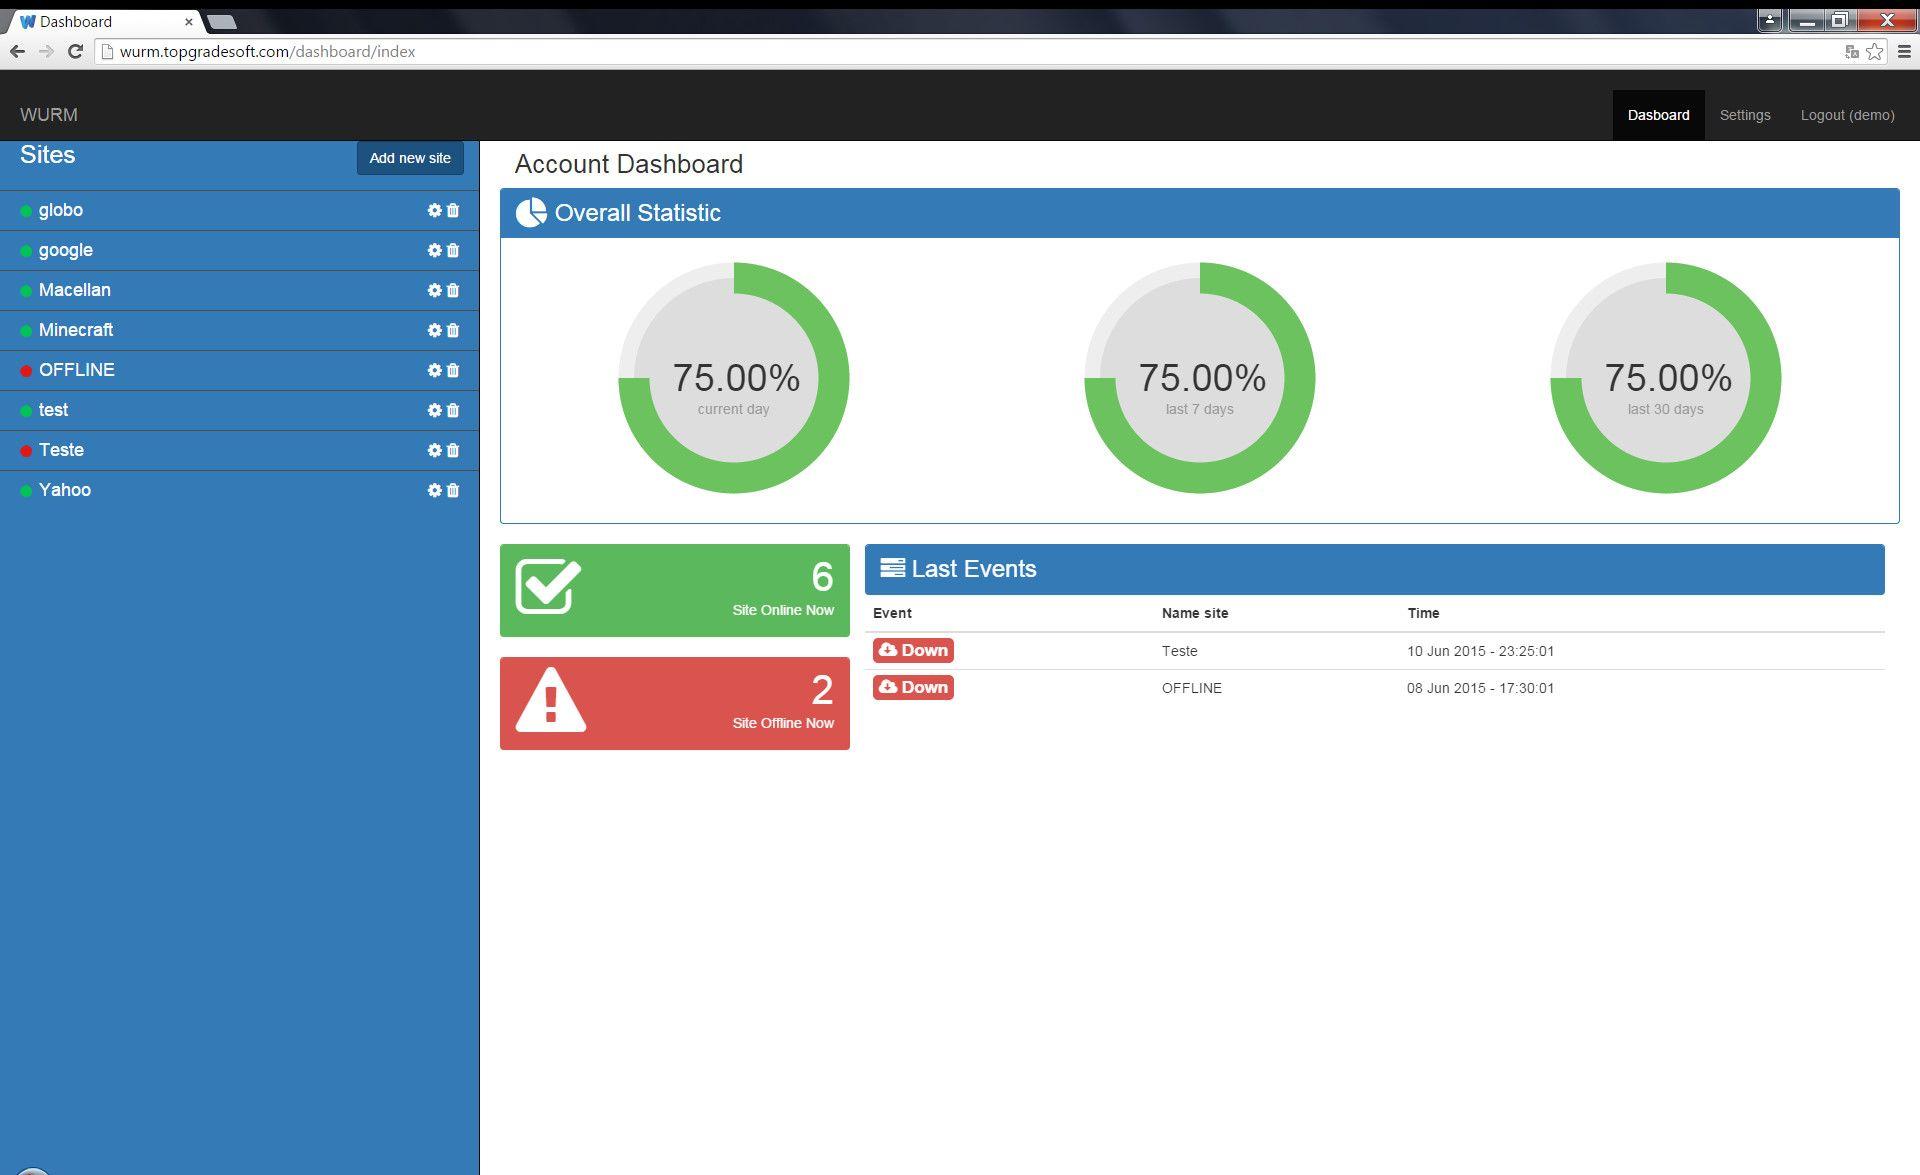 WURM - Website Uptime Robot Monitor